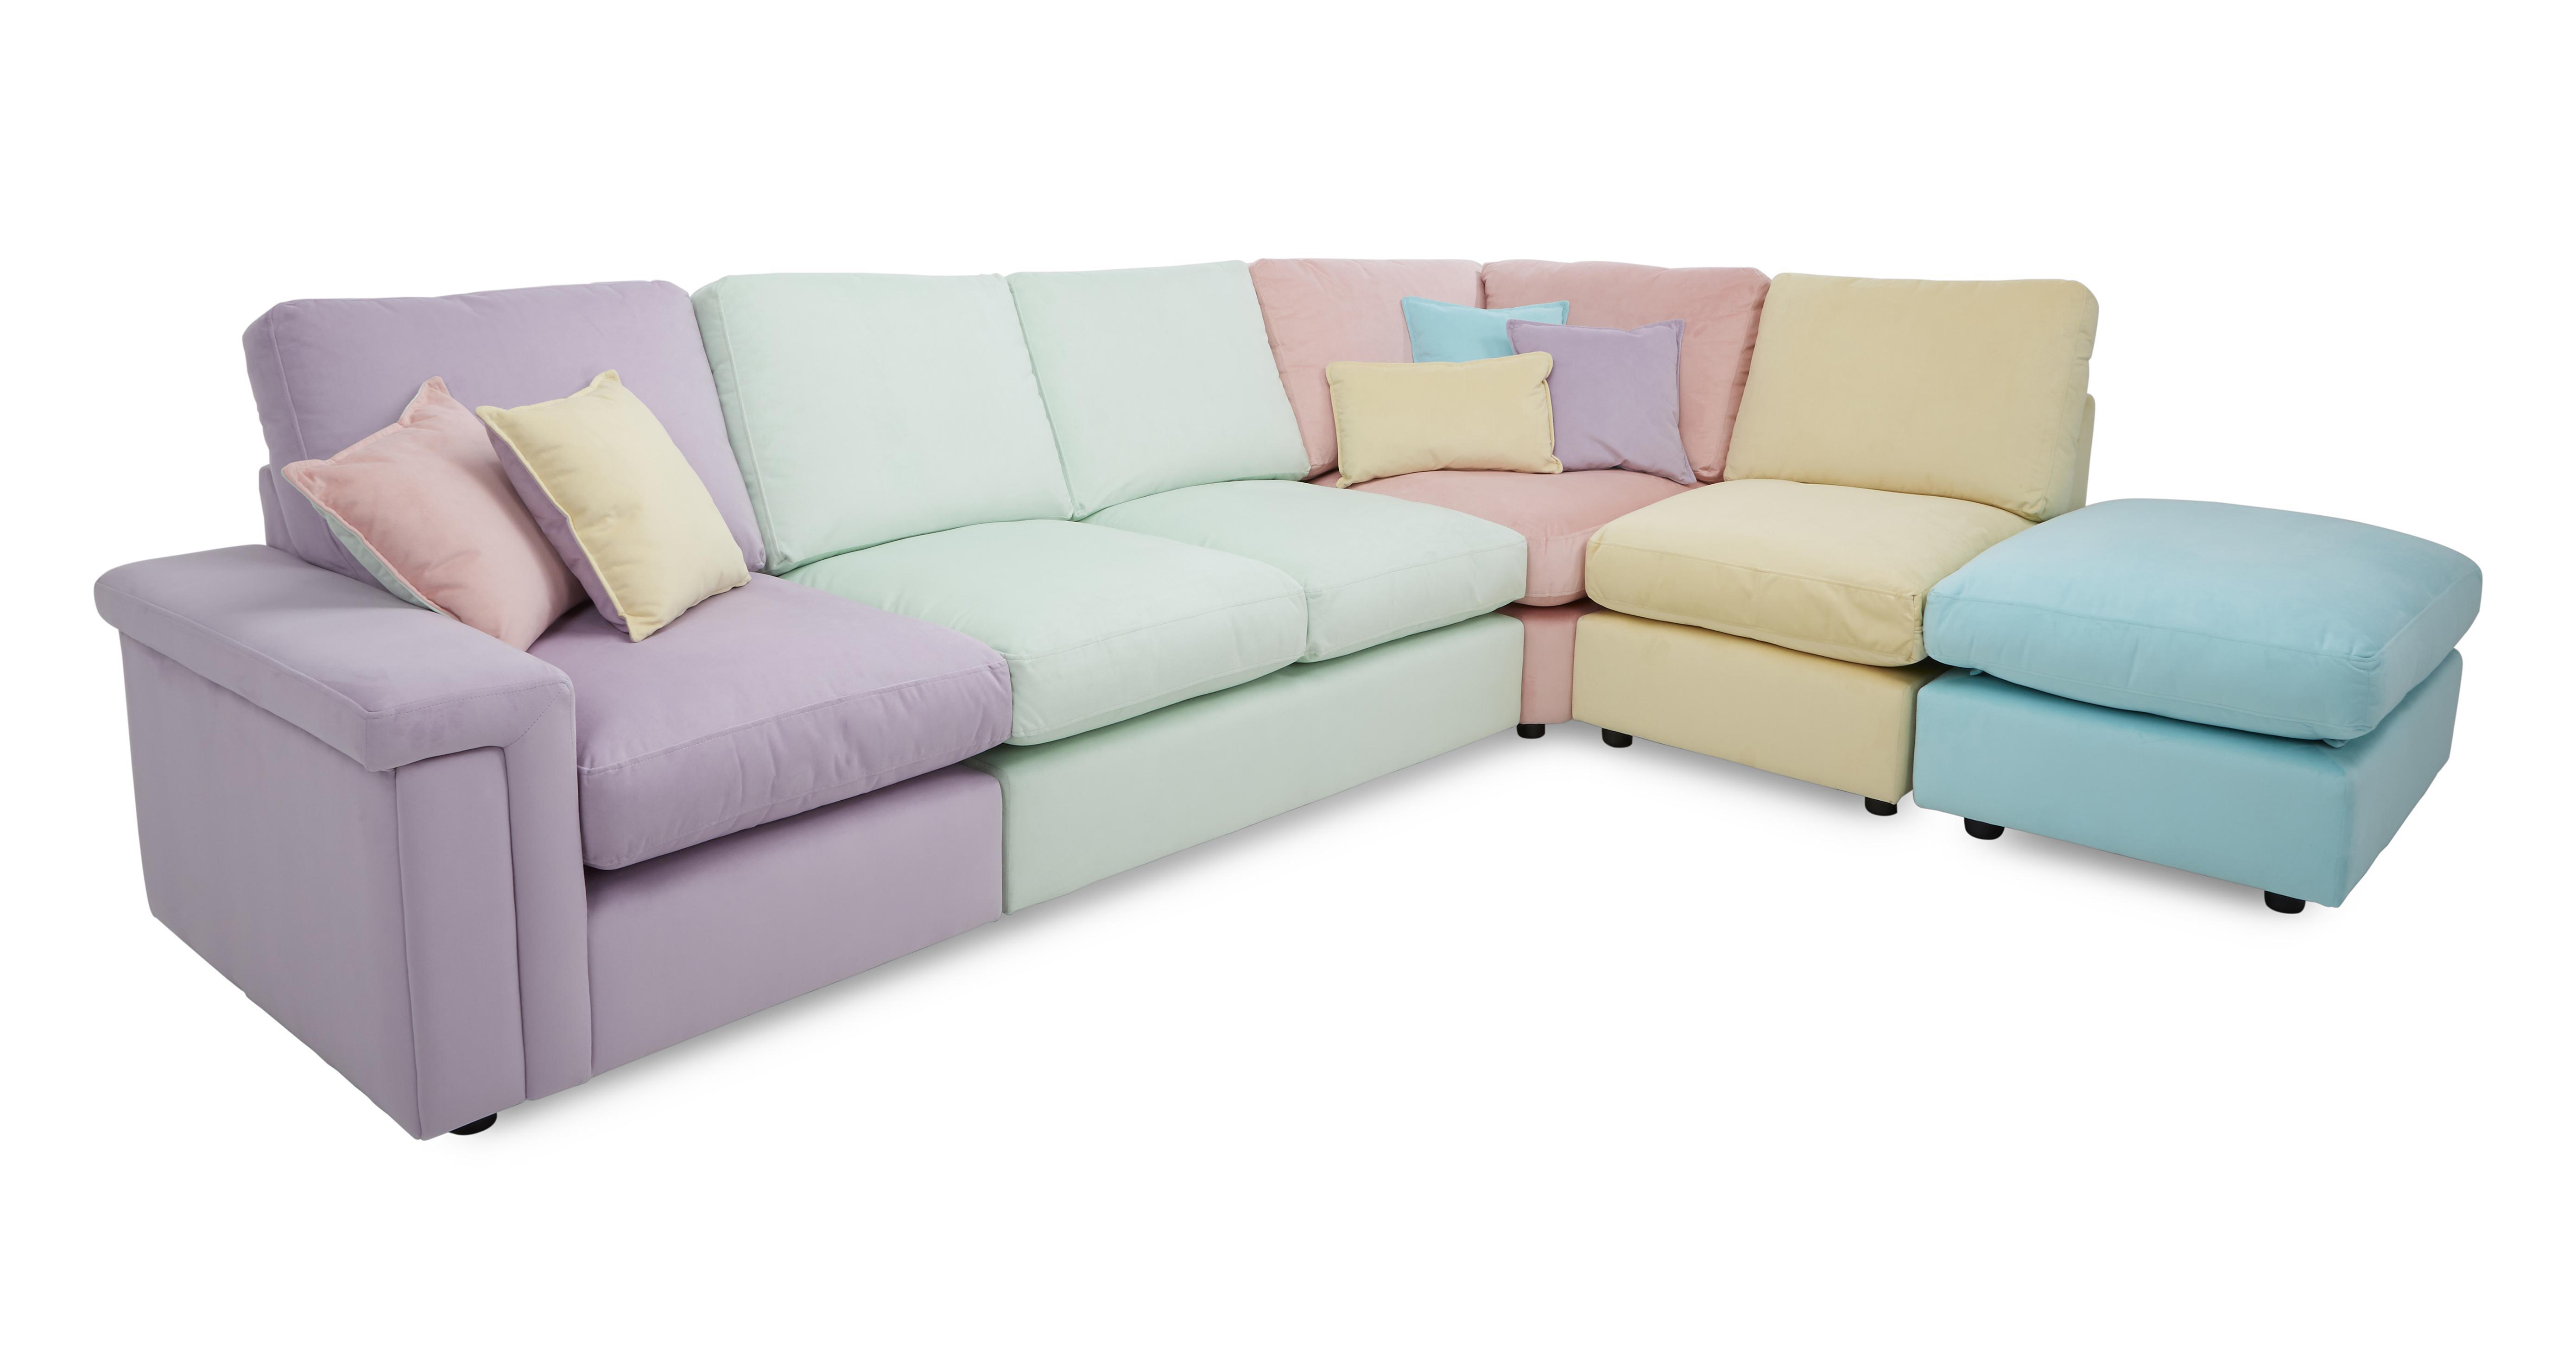 bedroom chair dfs diy hanging tropica multi coloured fabric sofa set - corner sofa, & stool (54821) | ebay